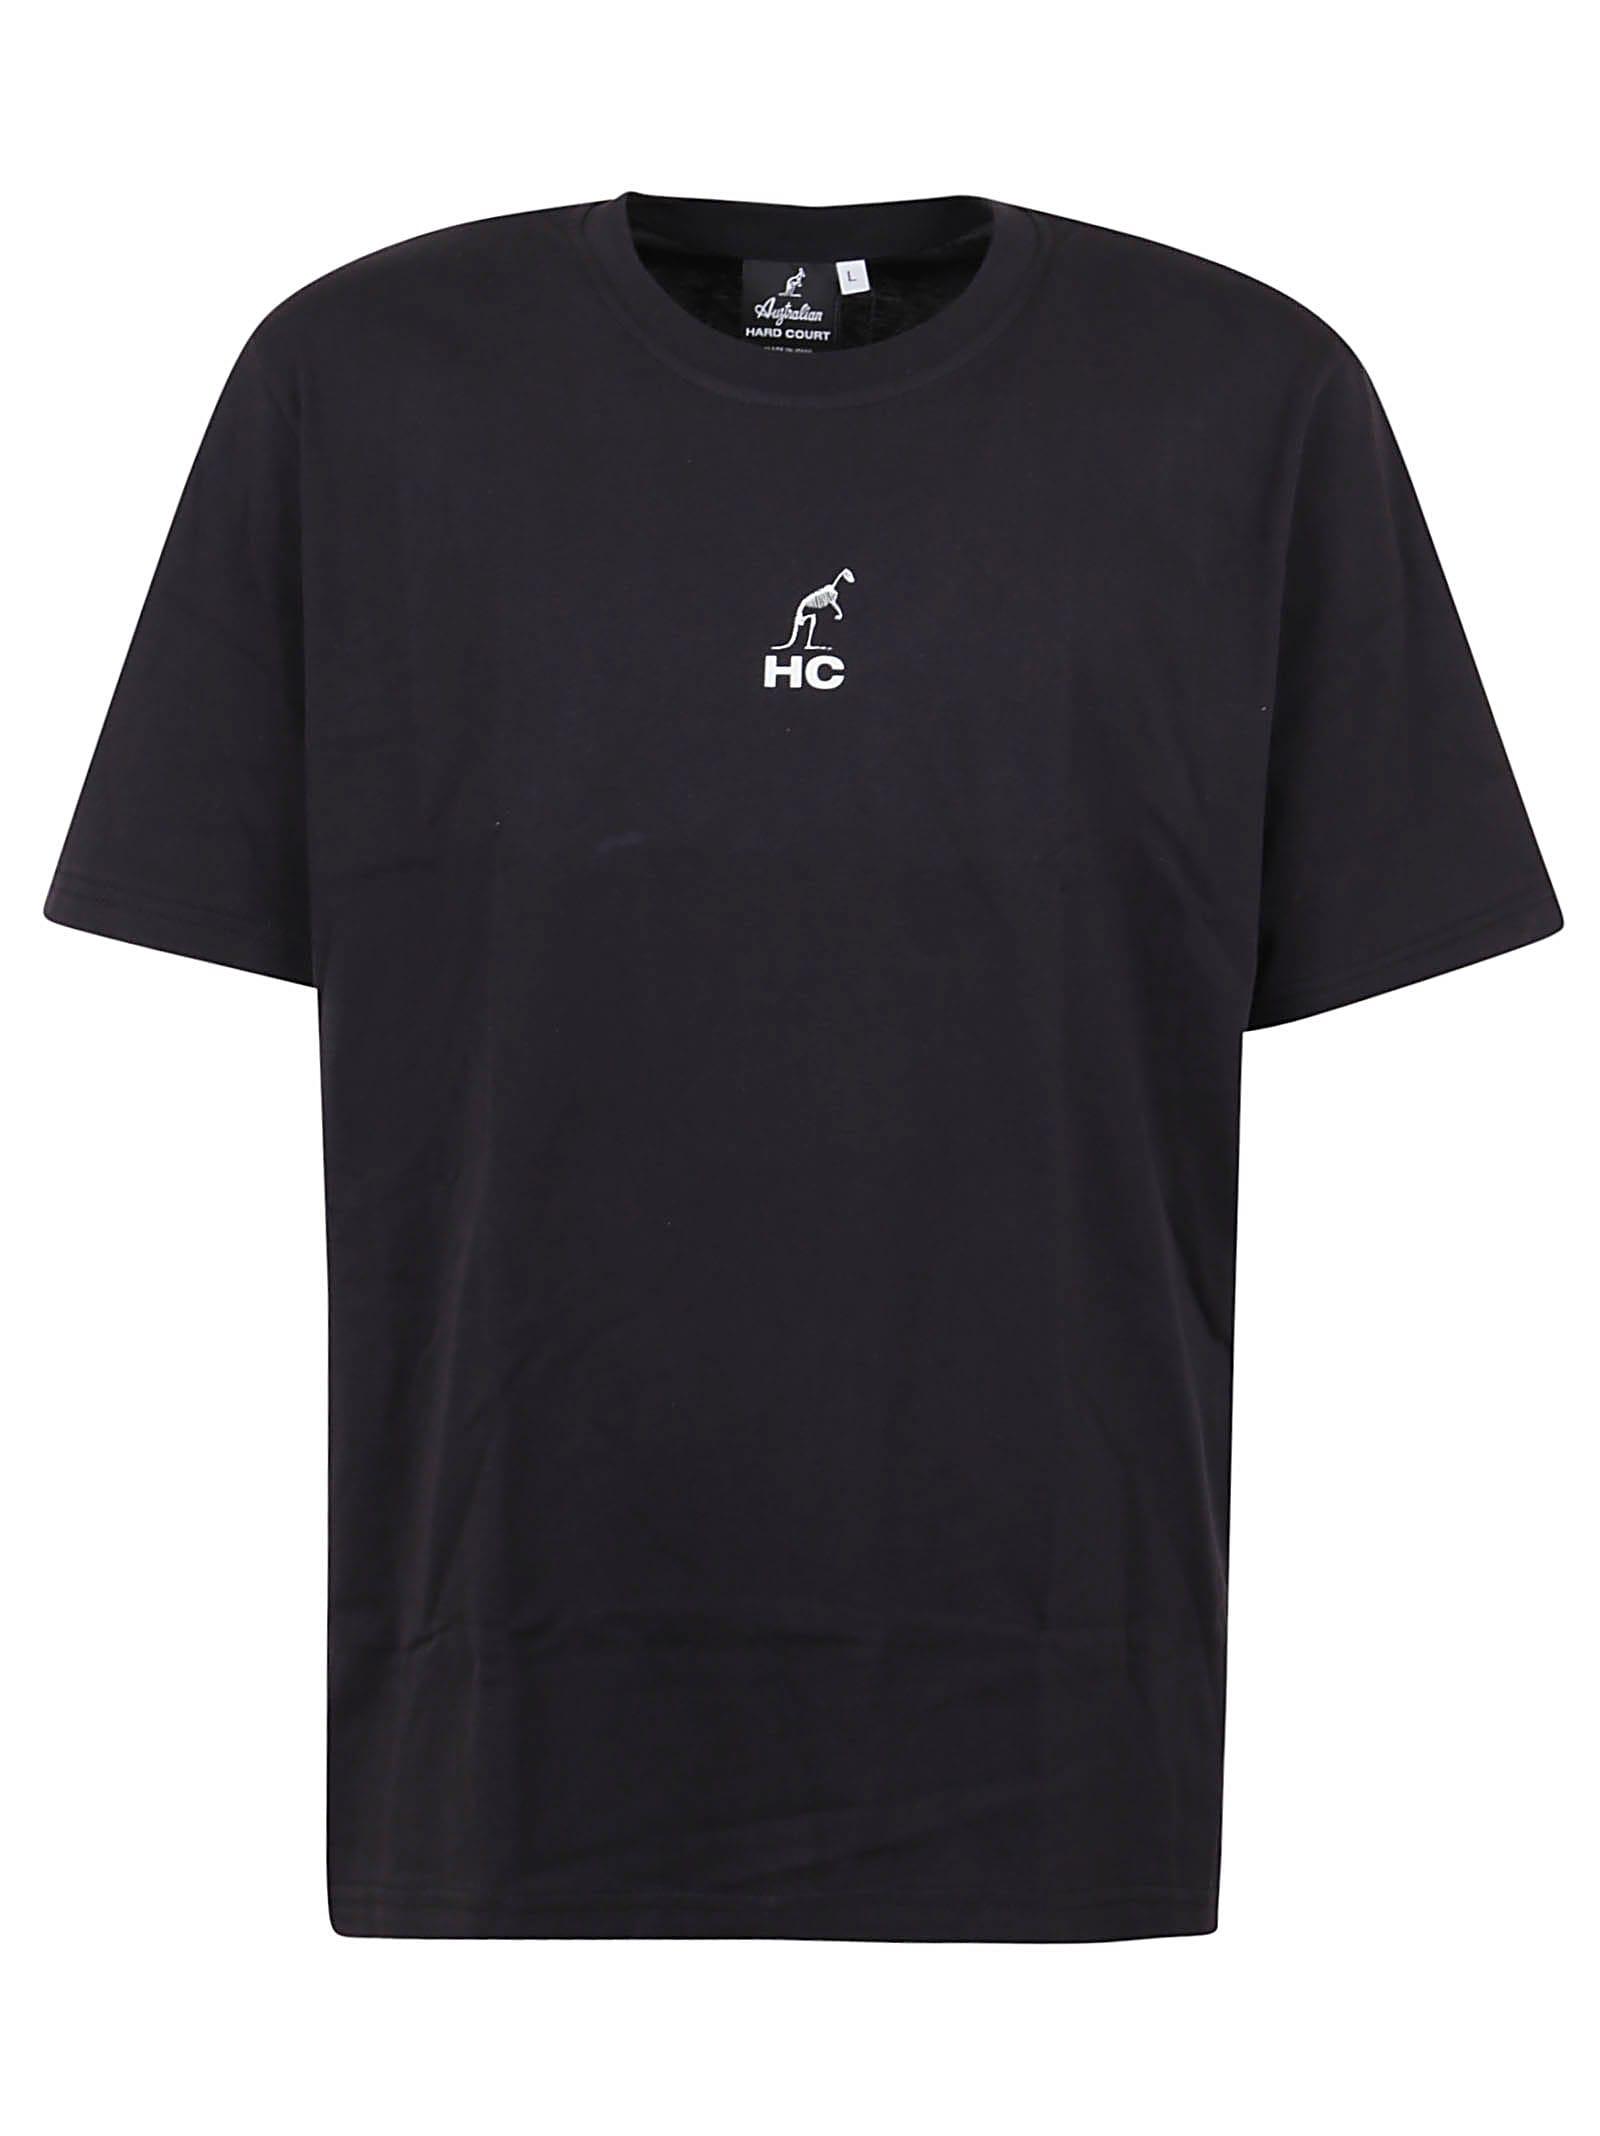 Jersey T-shirt With Bones Luminol Print